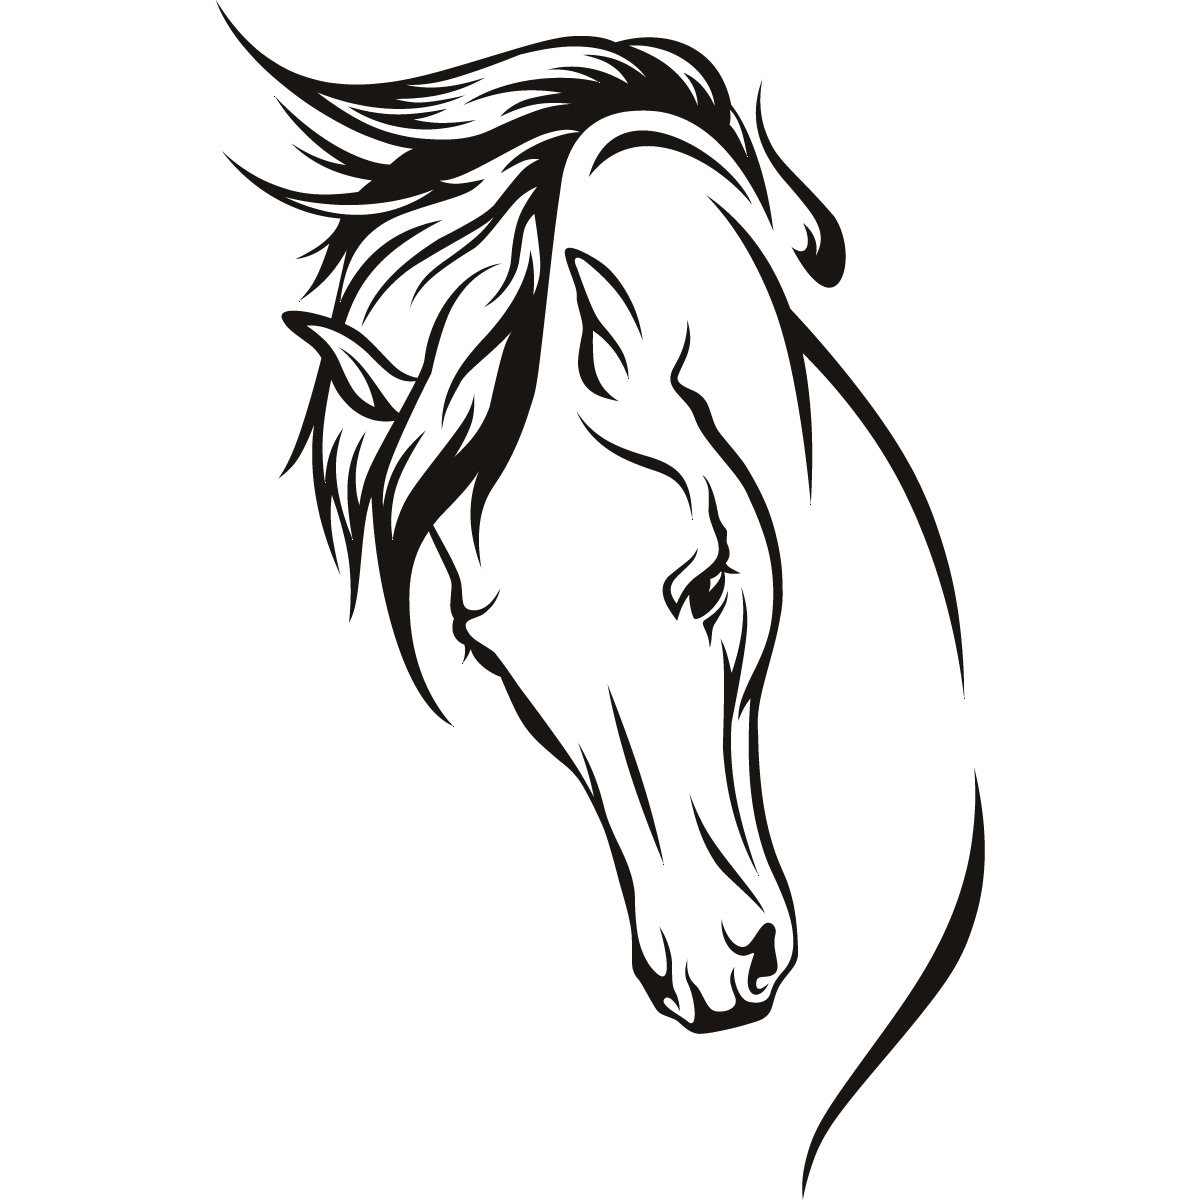 Horses Head Wall Art Stickers Wall Decal Transfers | eBay